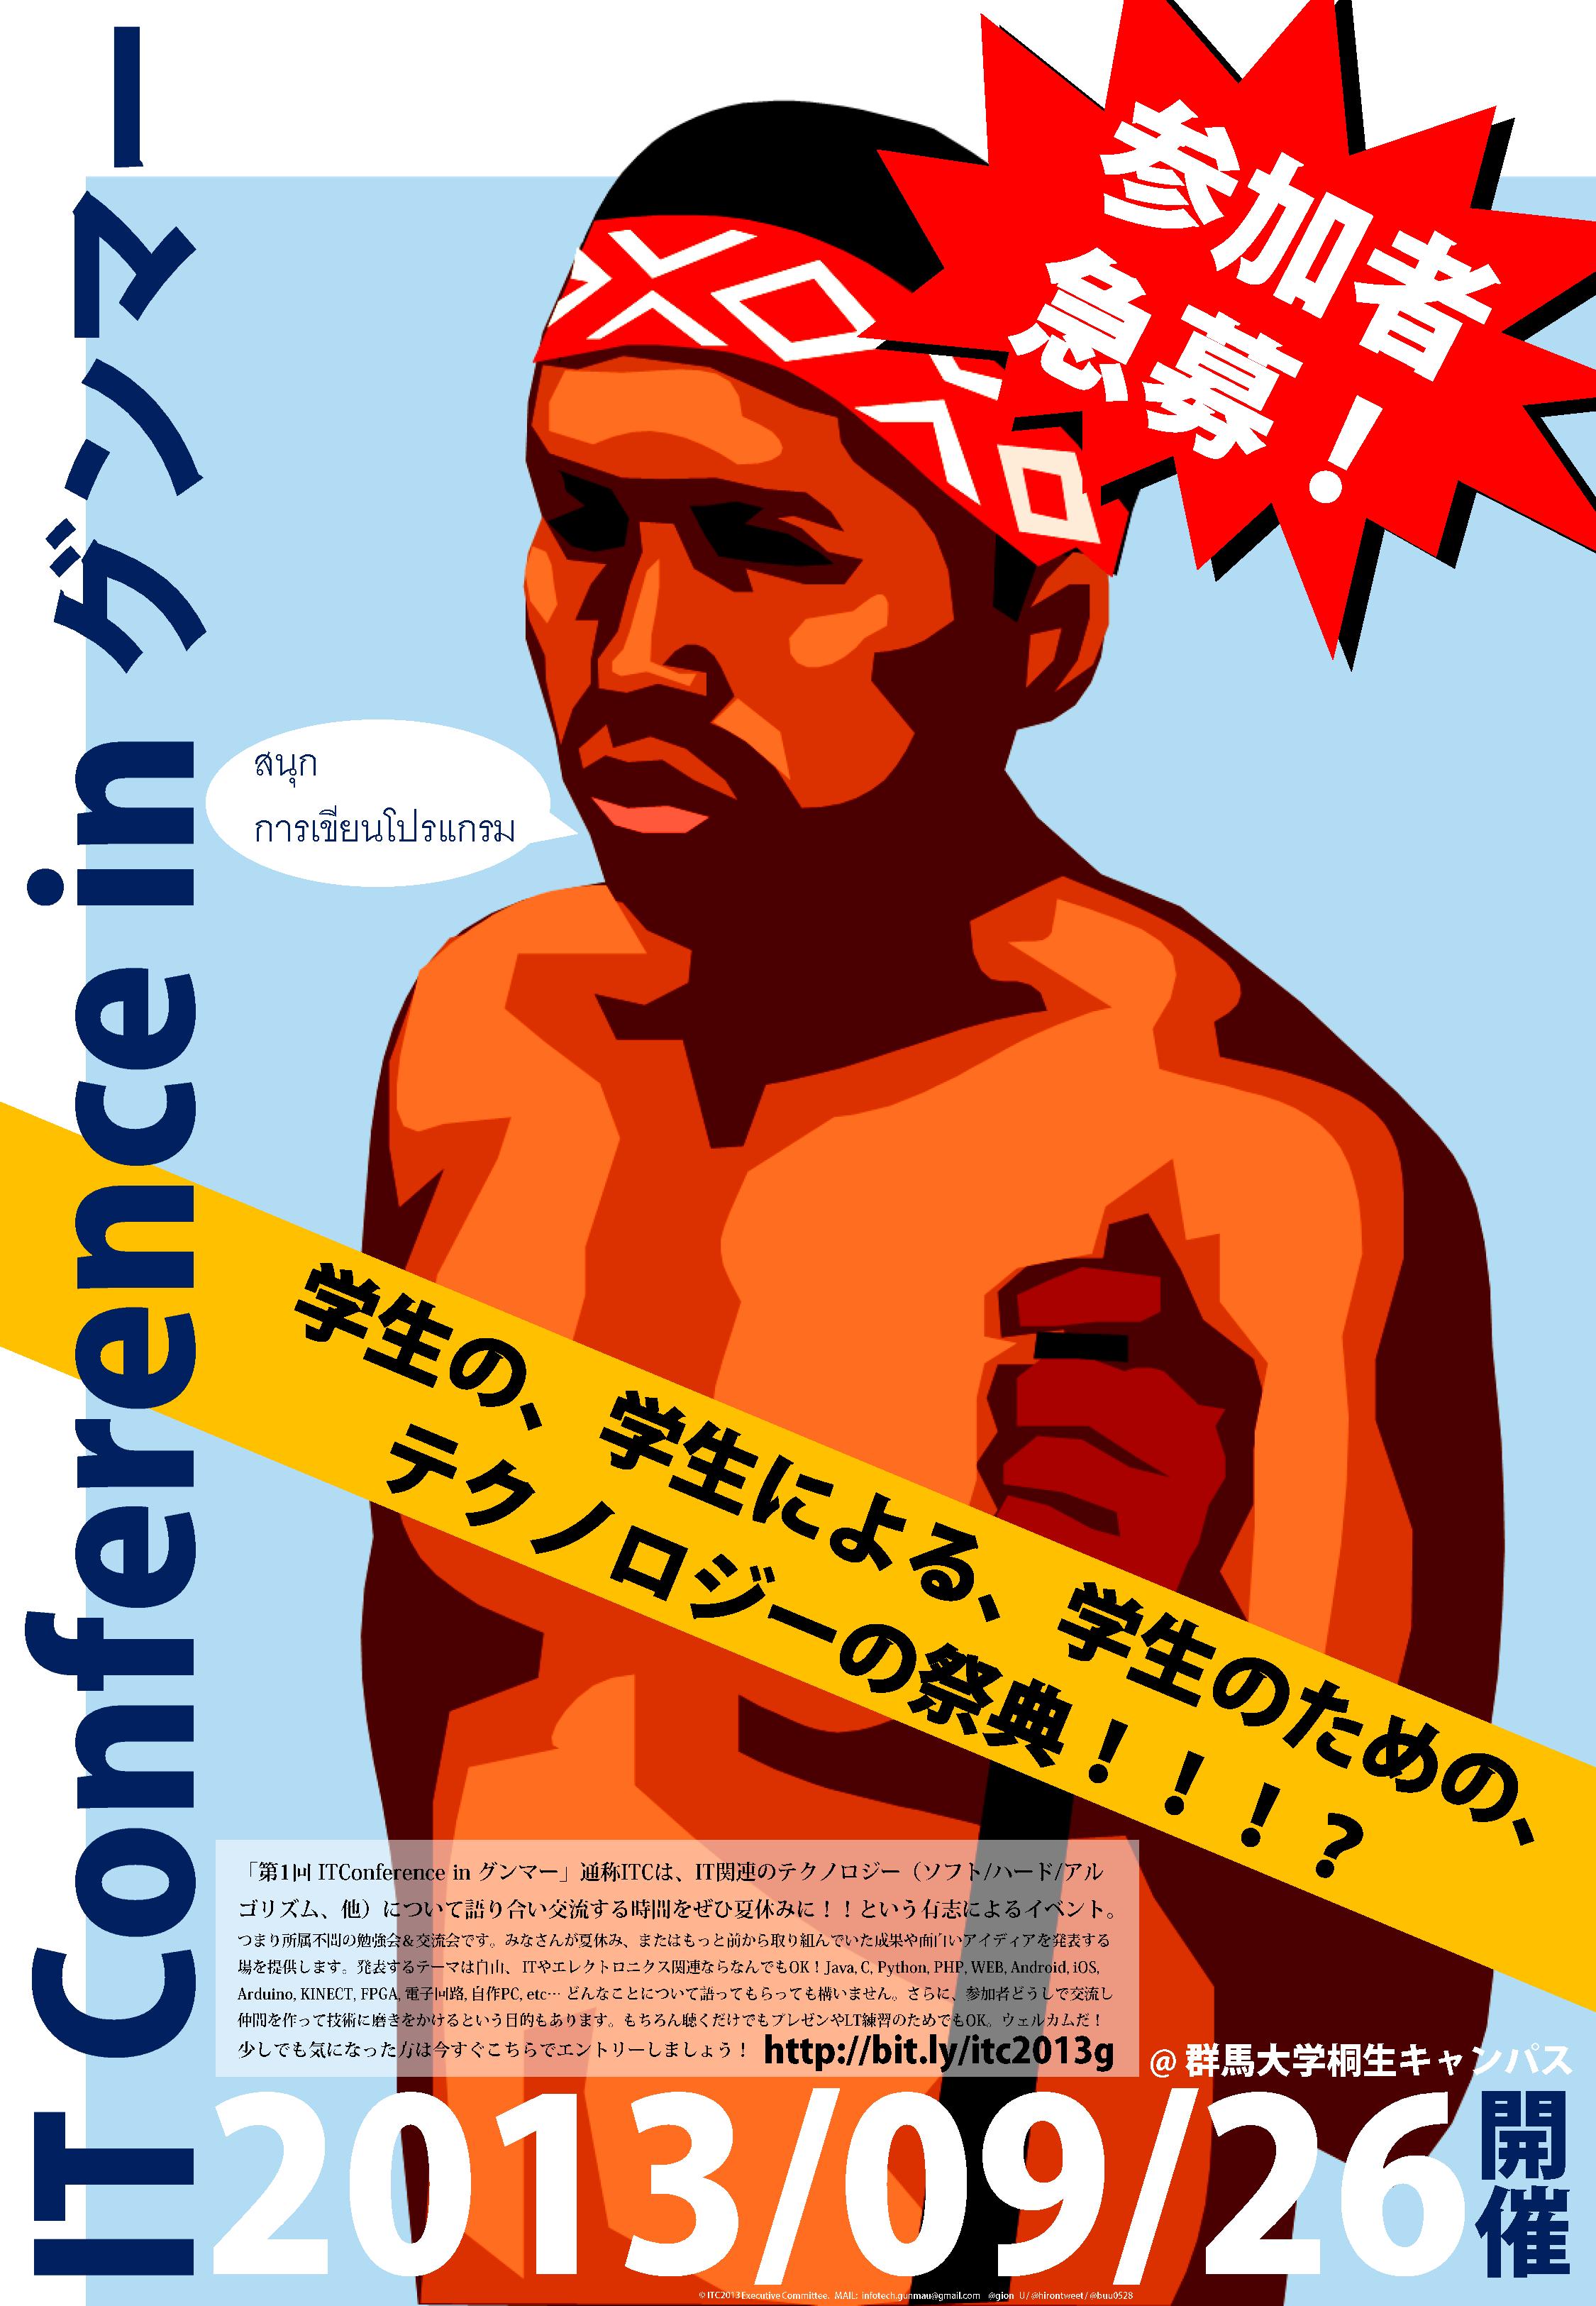 ITCinグンマー2013夏の陣 ポスター